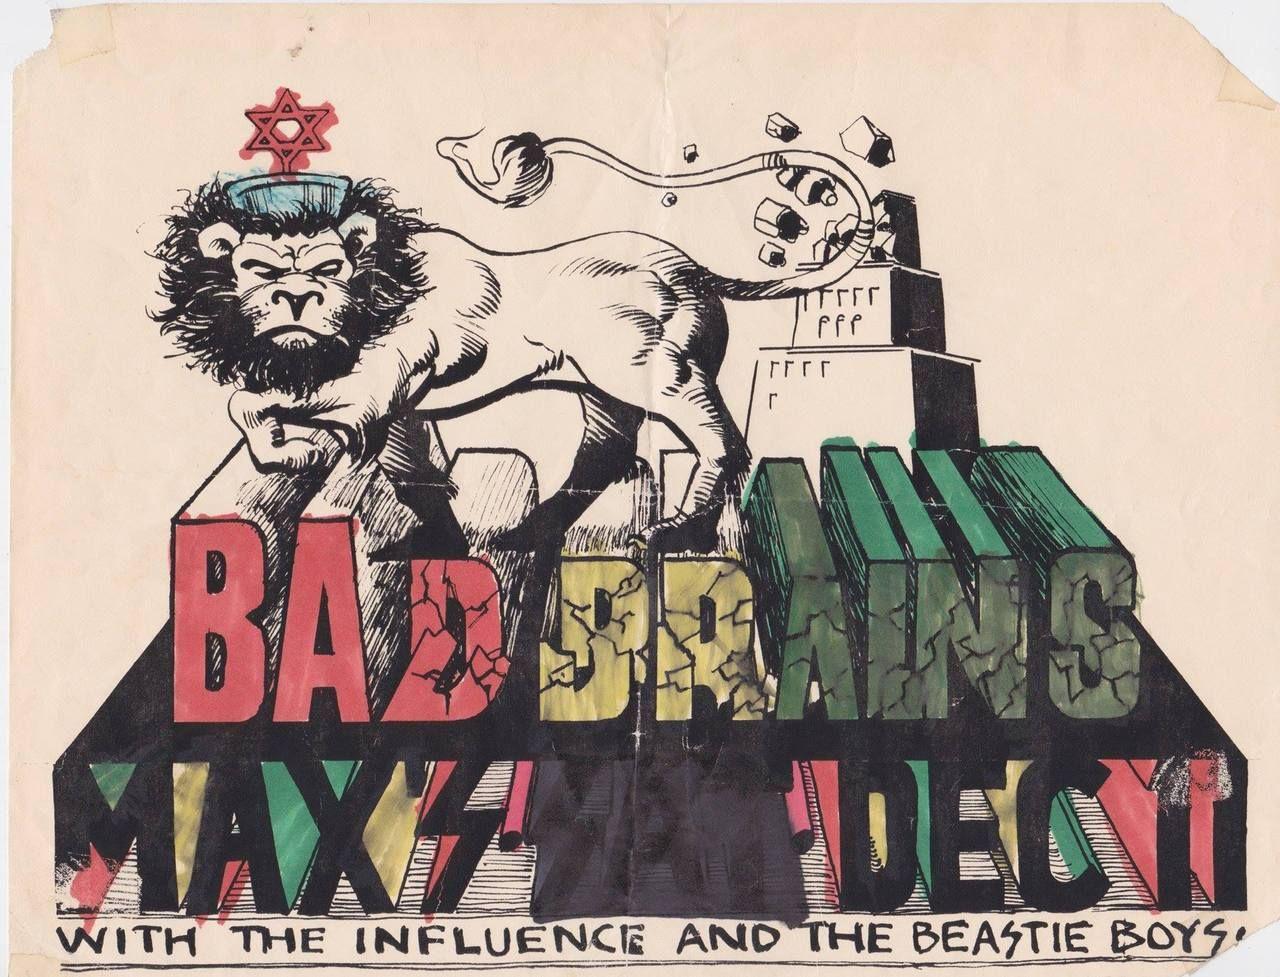 Bad Brains poster